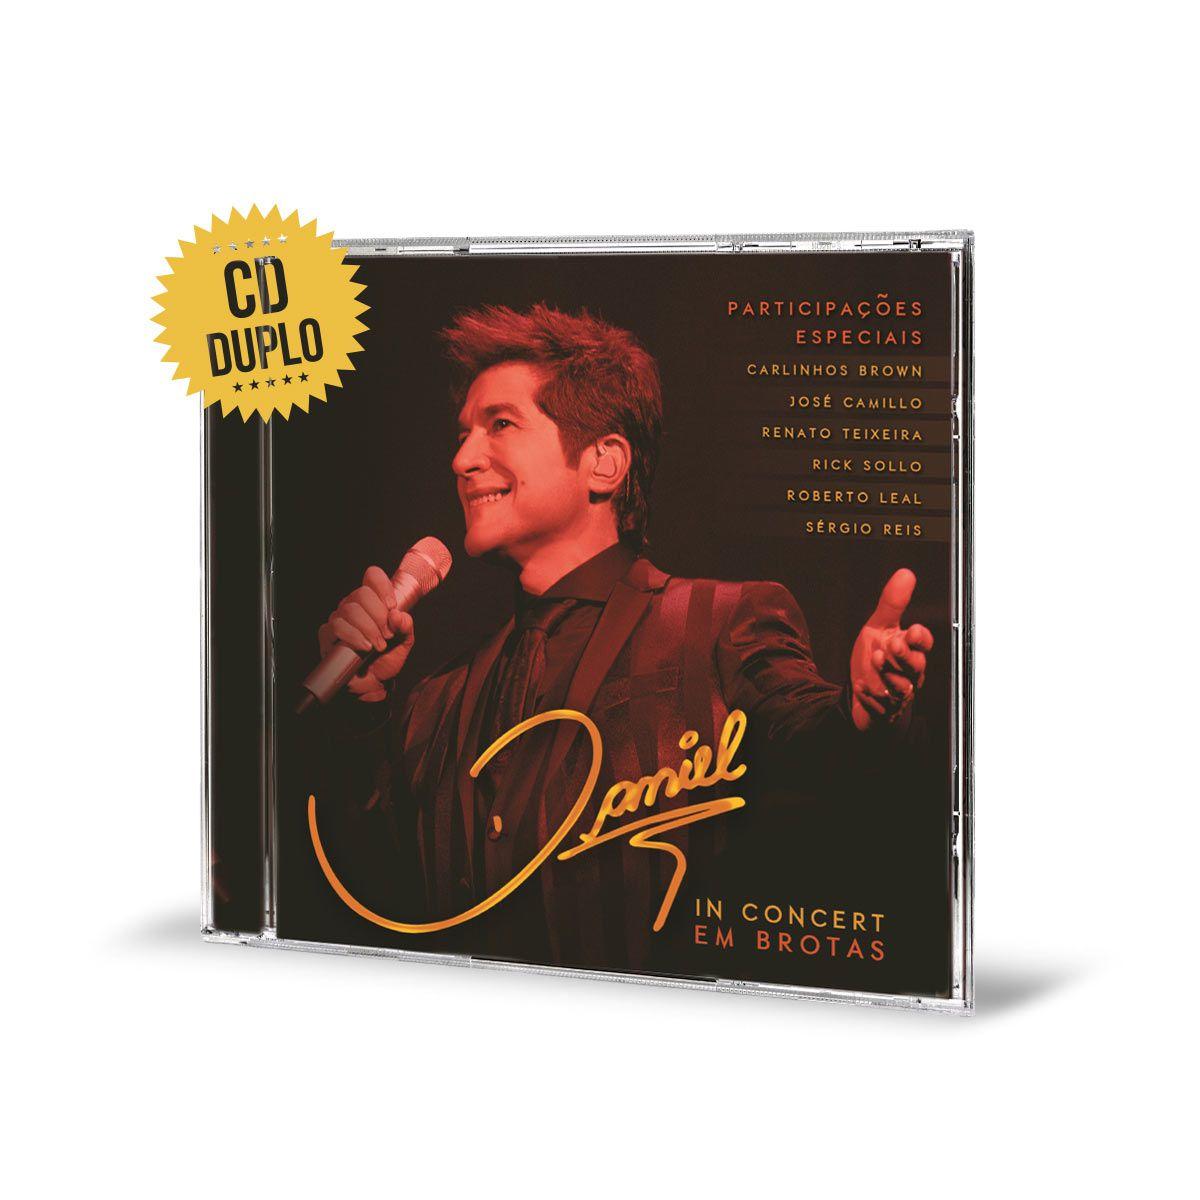 Daniel - In Concert - Em Brotas - (CD Duplo)